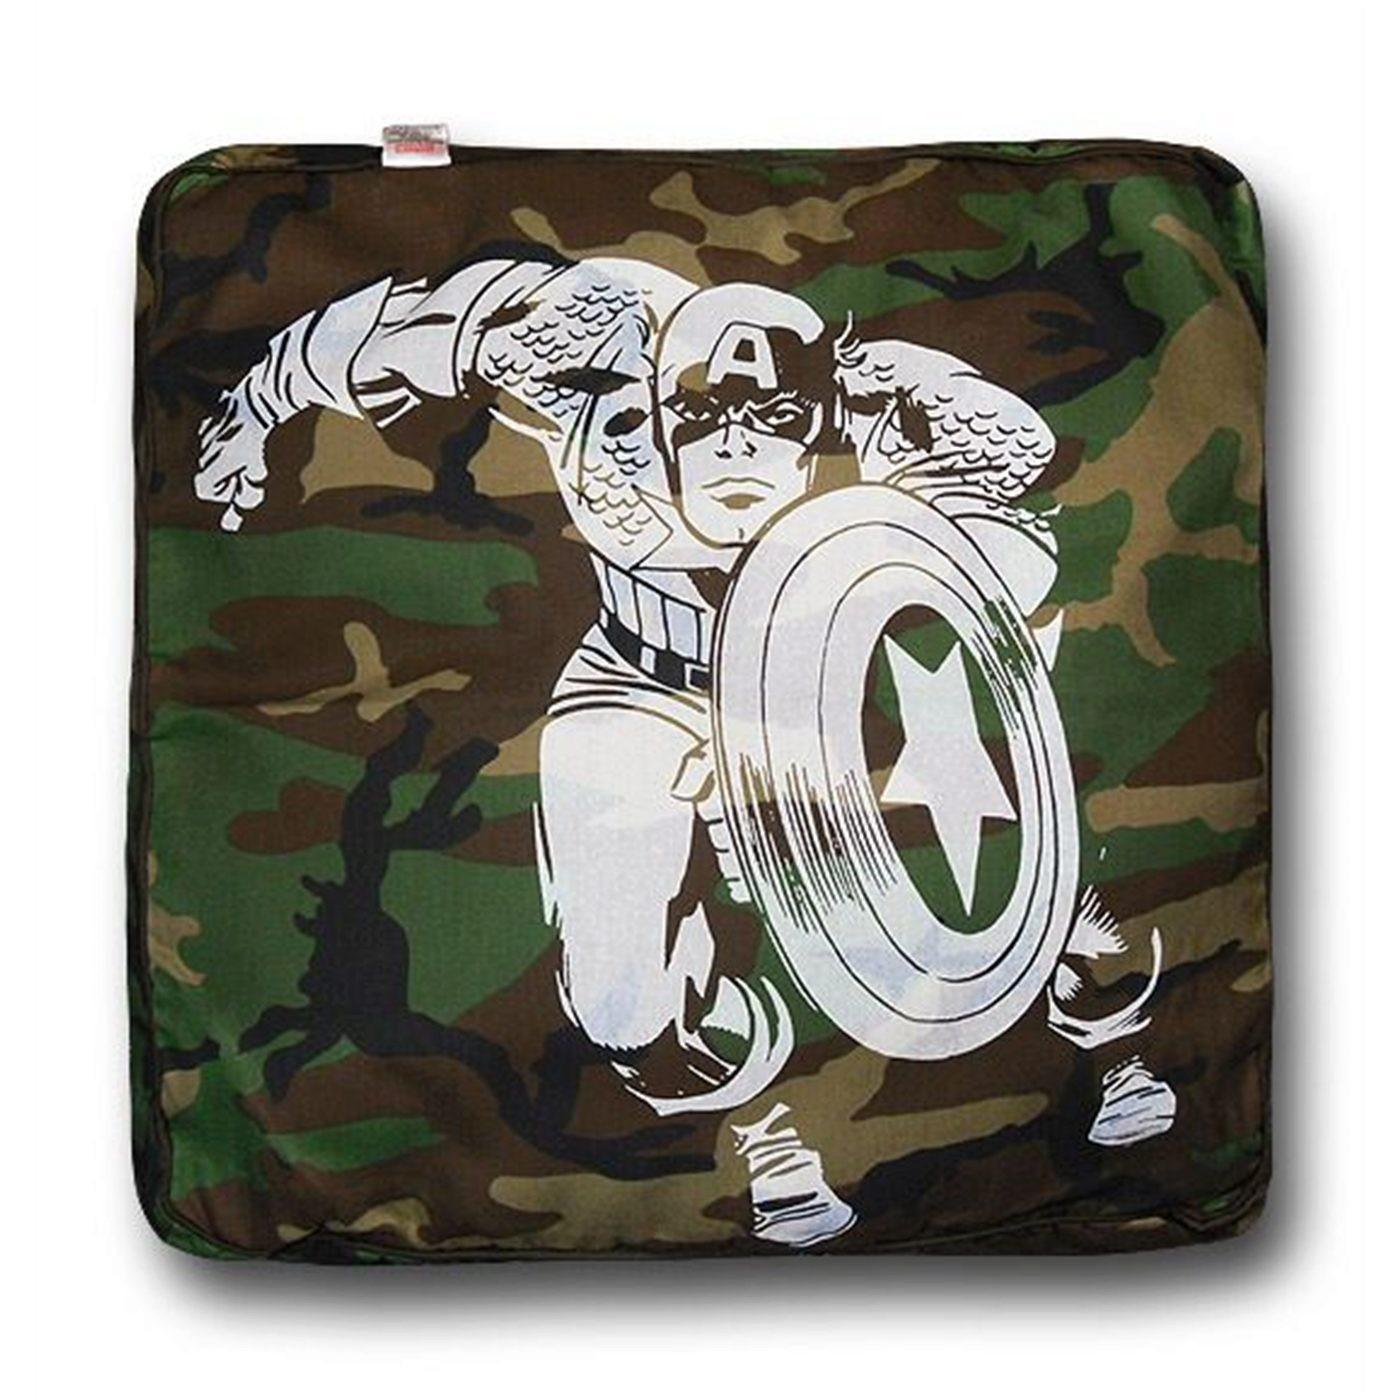 Captain America Square Vintage Dog Bed